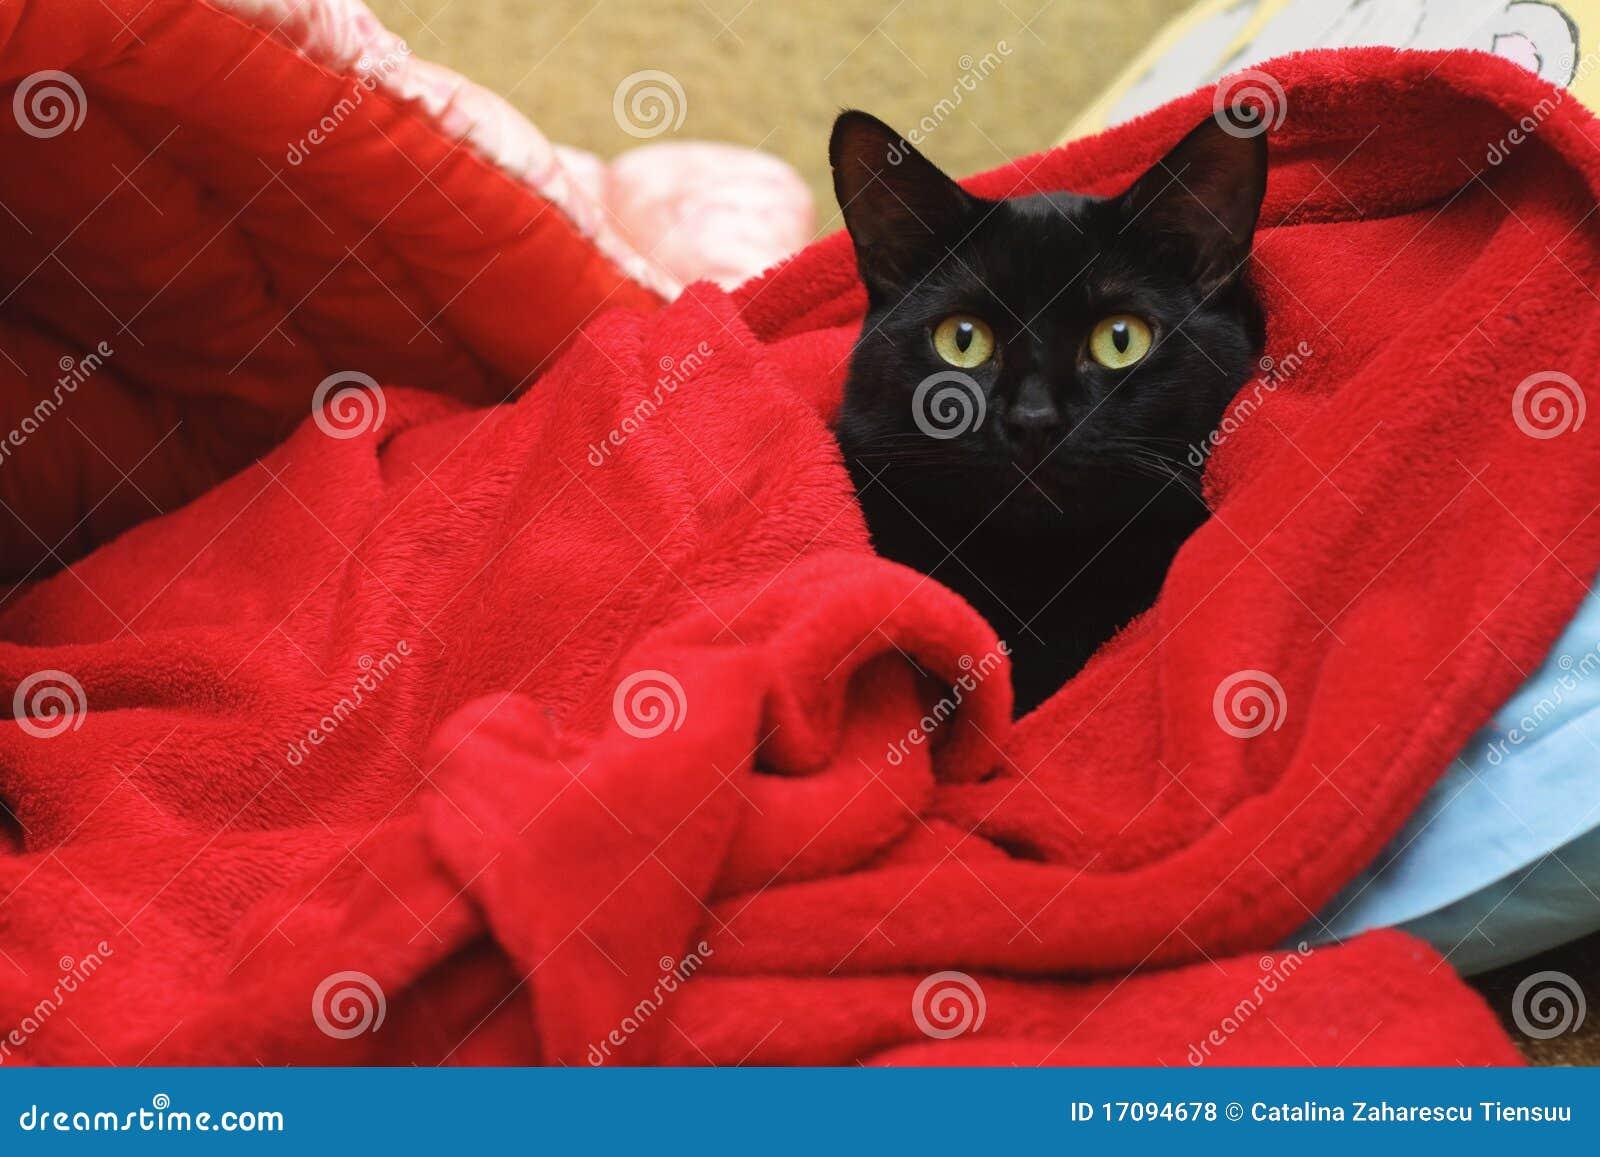 Black cat under a red blanket